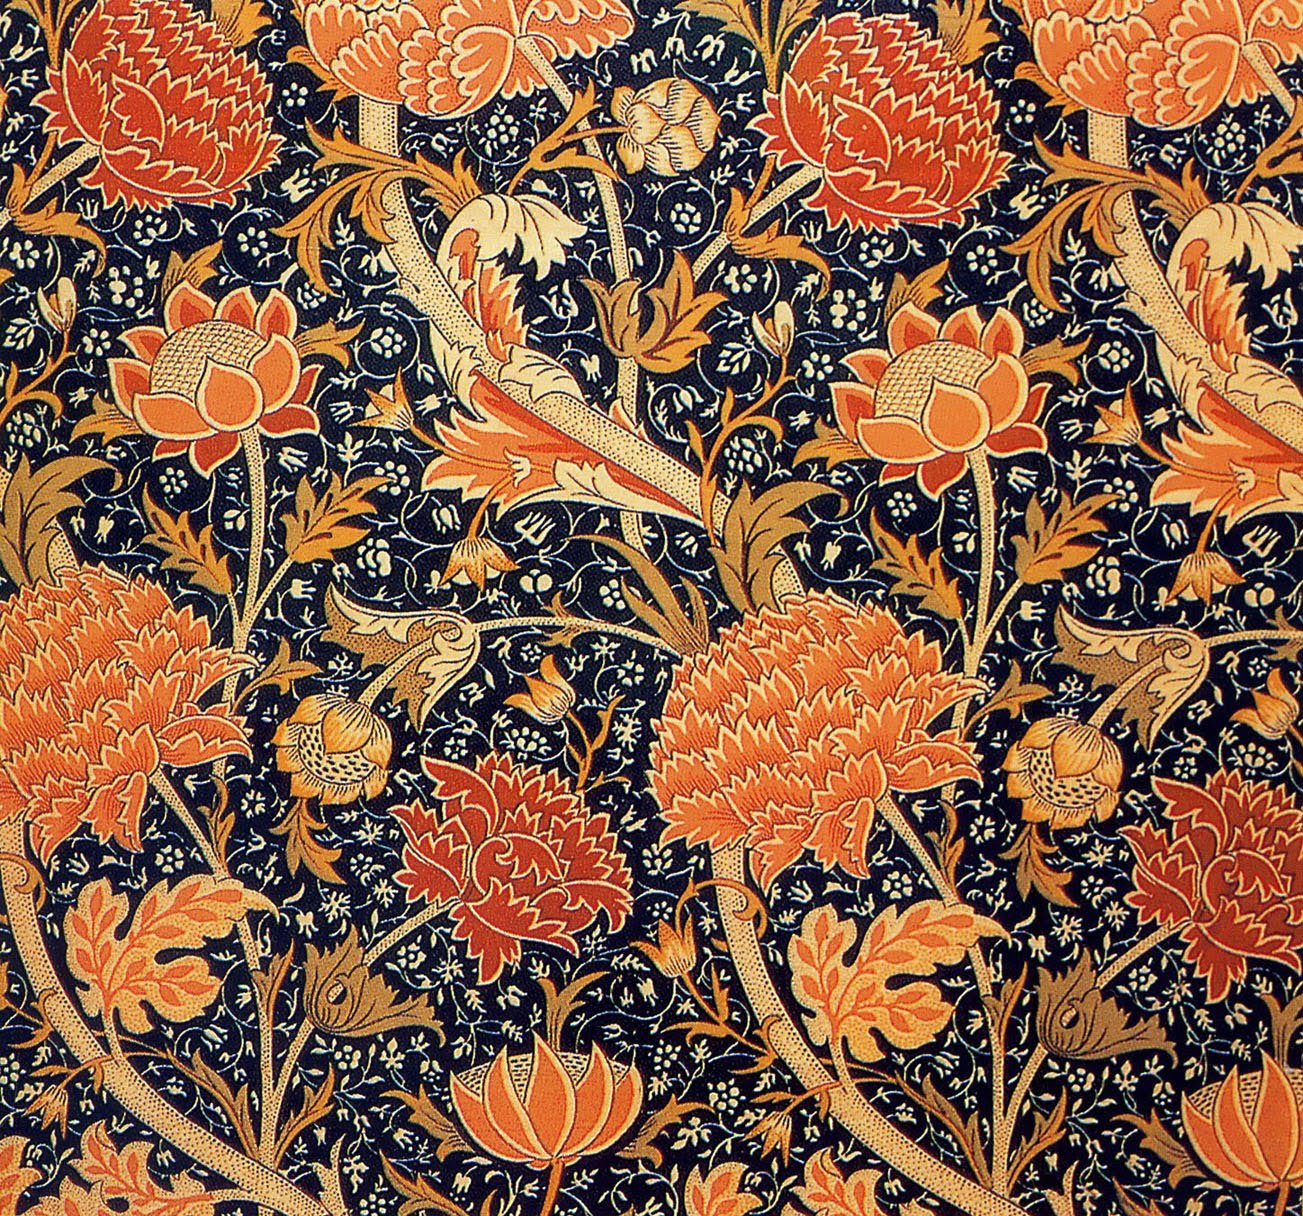 Art Artists William Morris Wallpaper Textiles